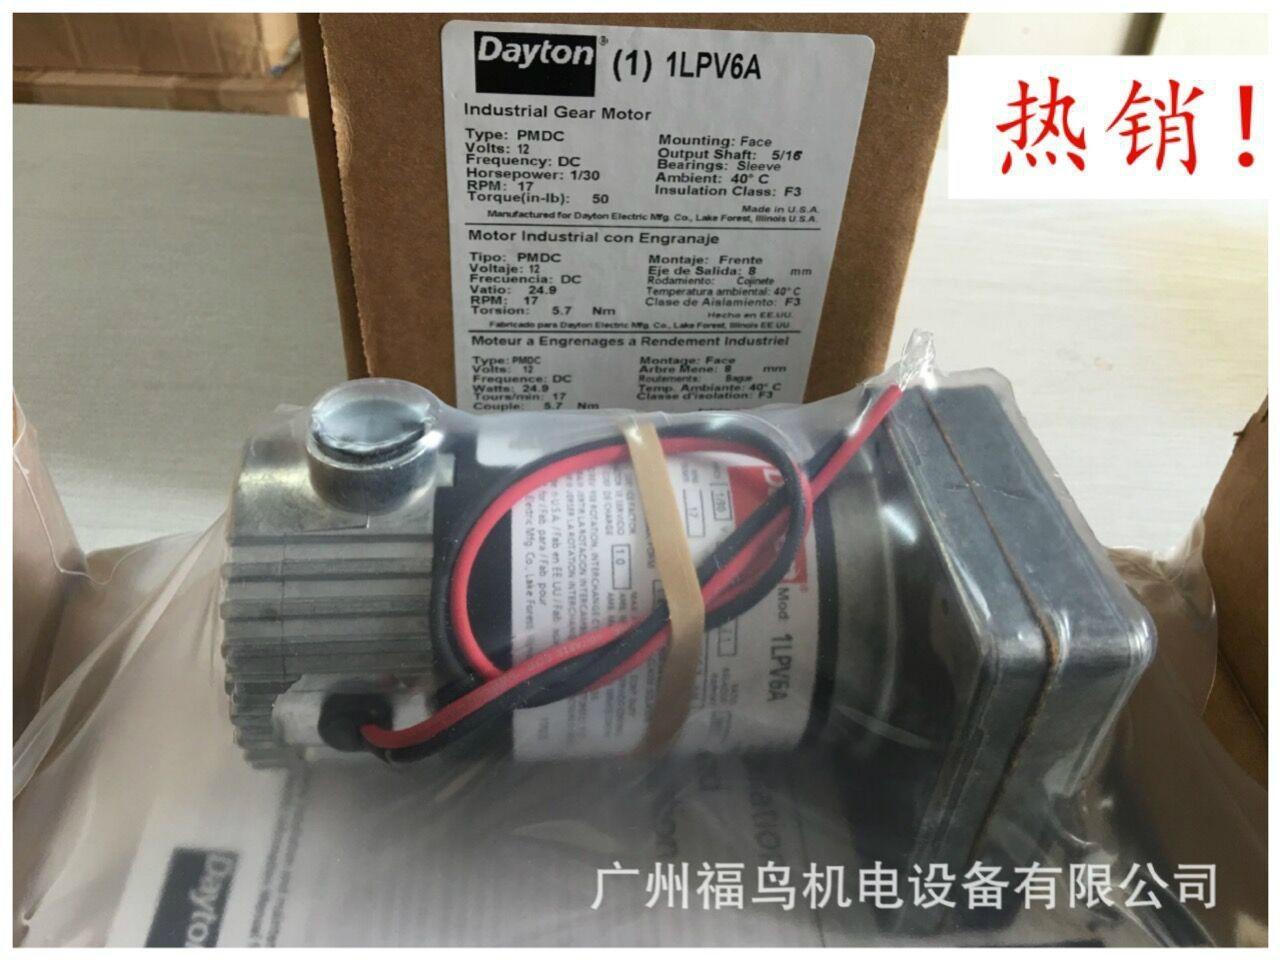 DAYTON电机, 马达, 型号: 1LPV6A, 1LPV6